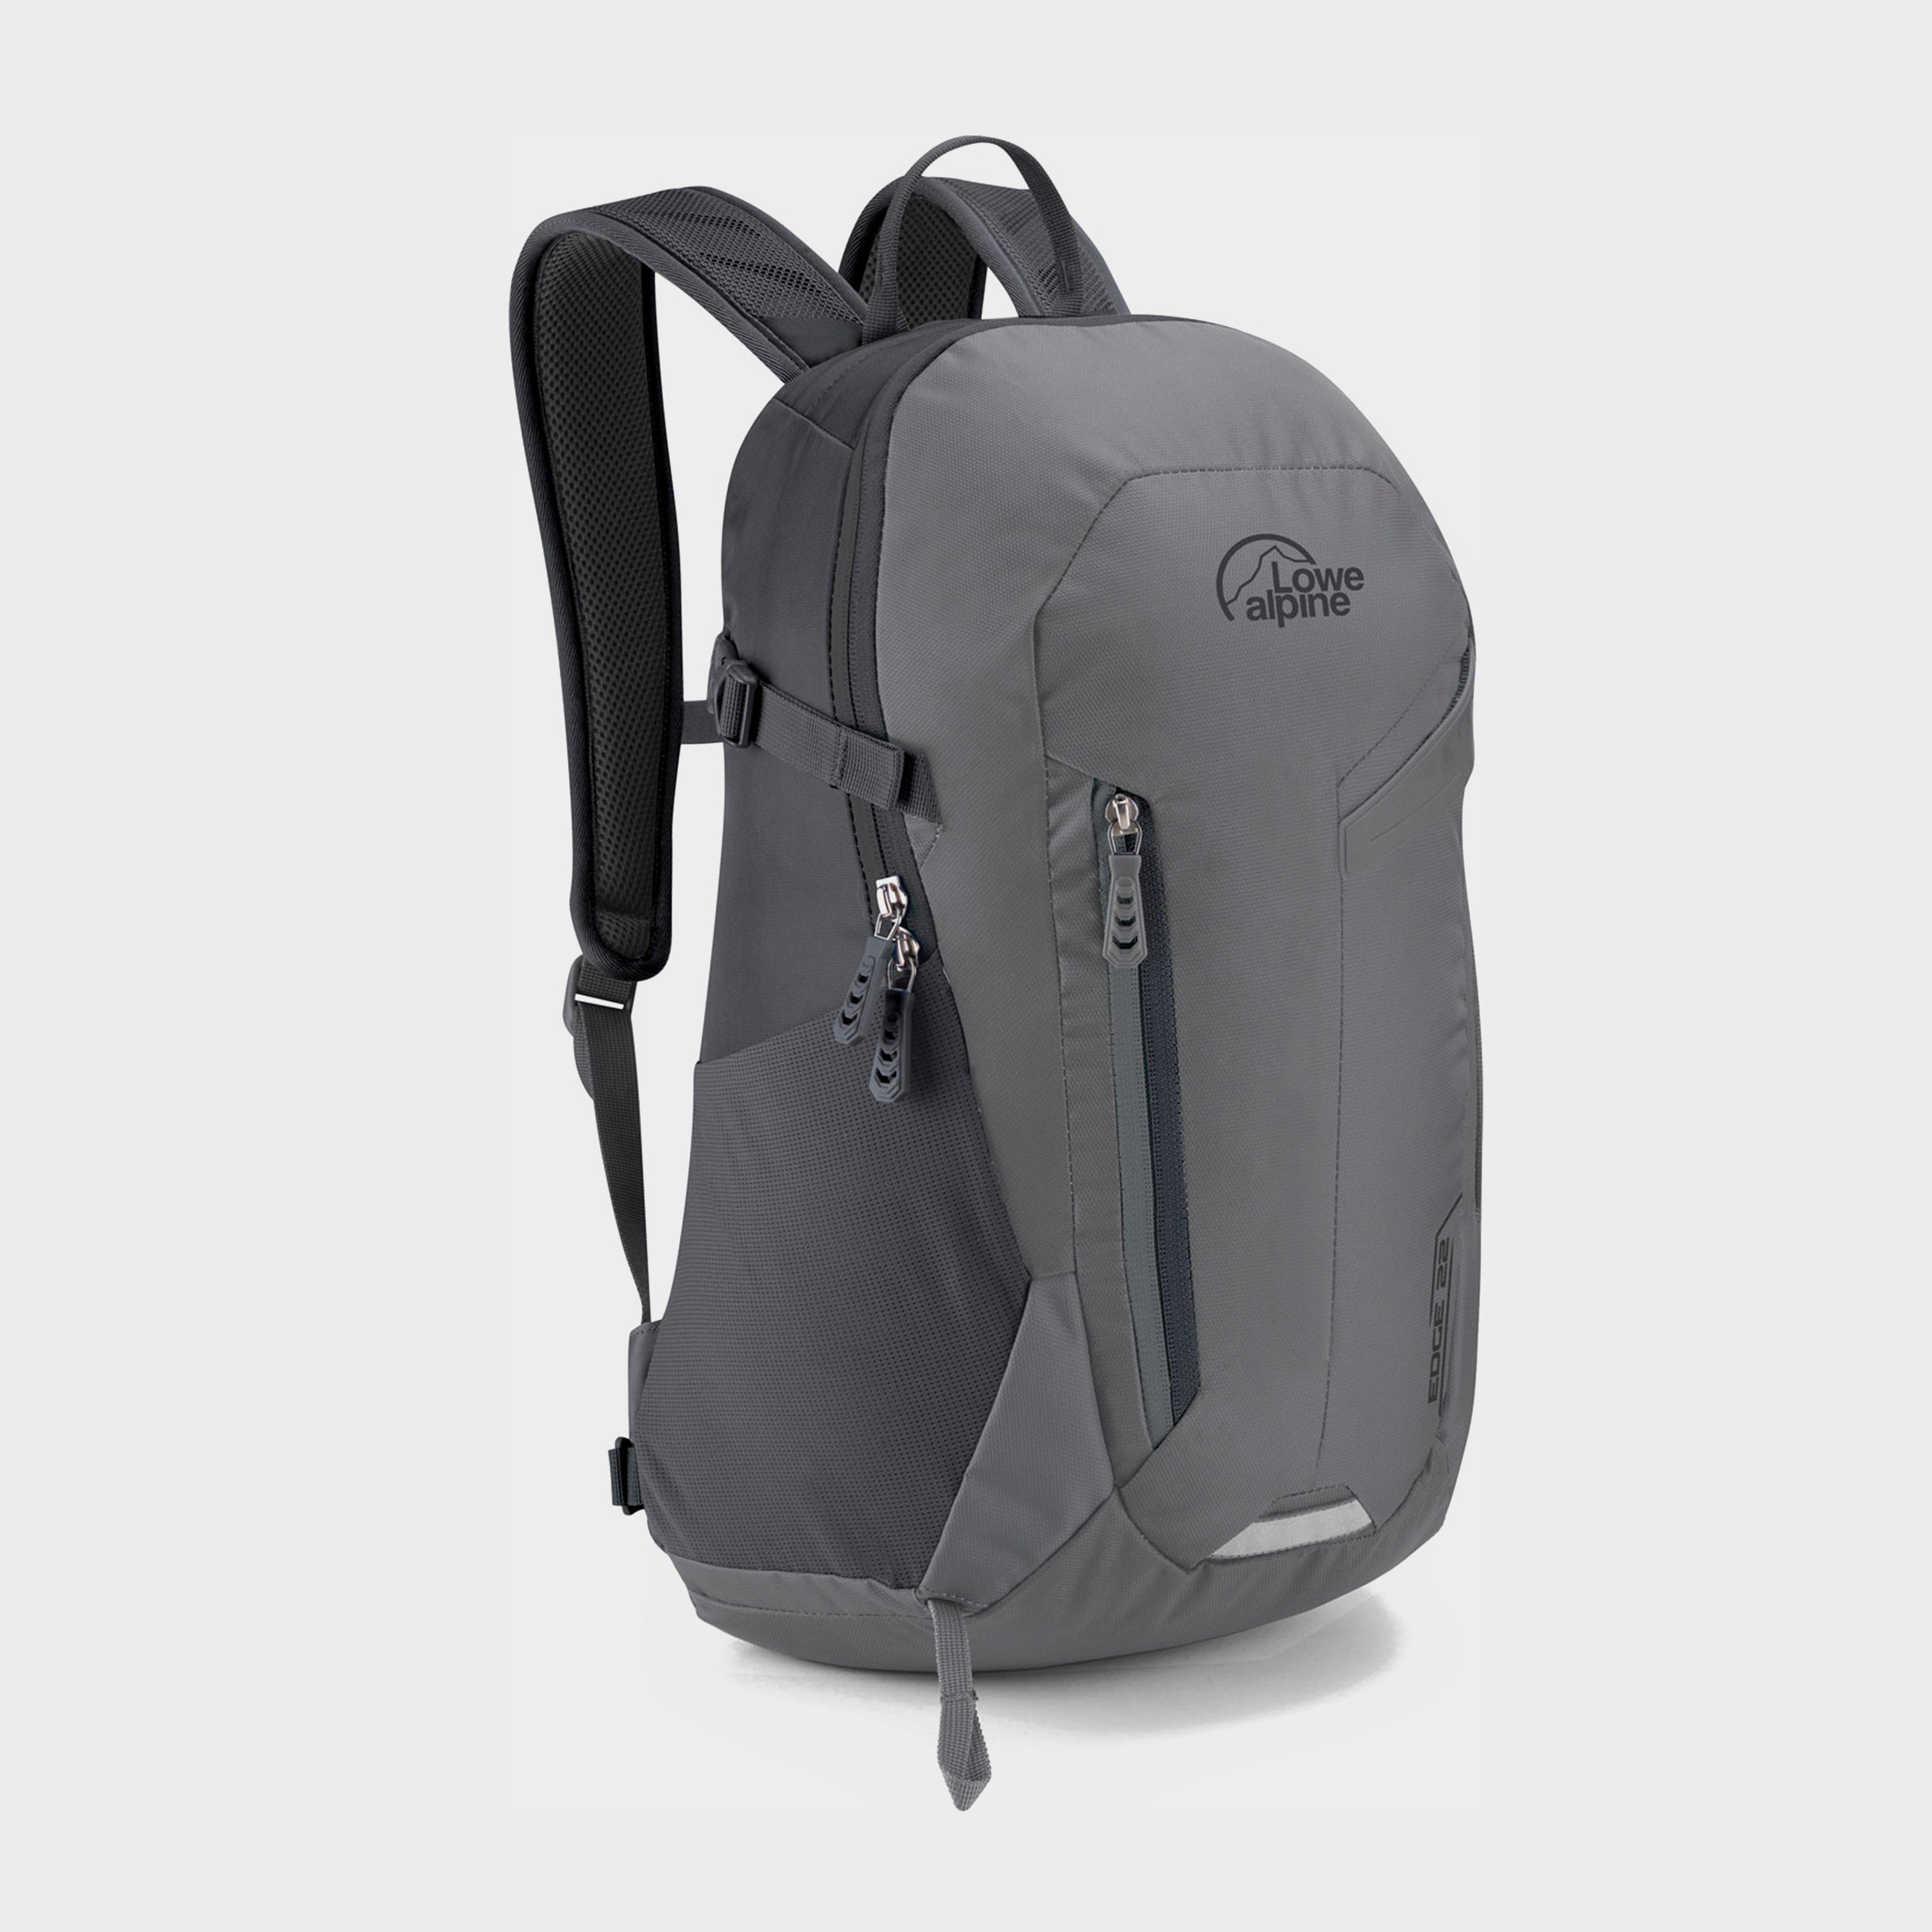 Lowe Alpine Edge II 22 Daysack, Grey